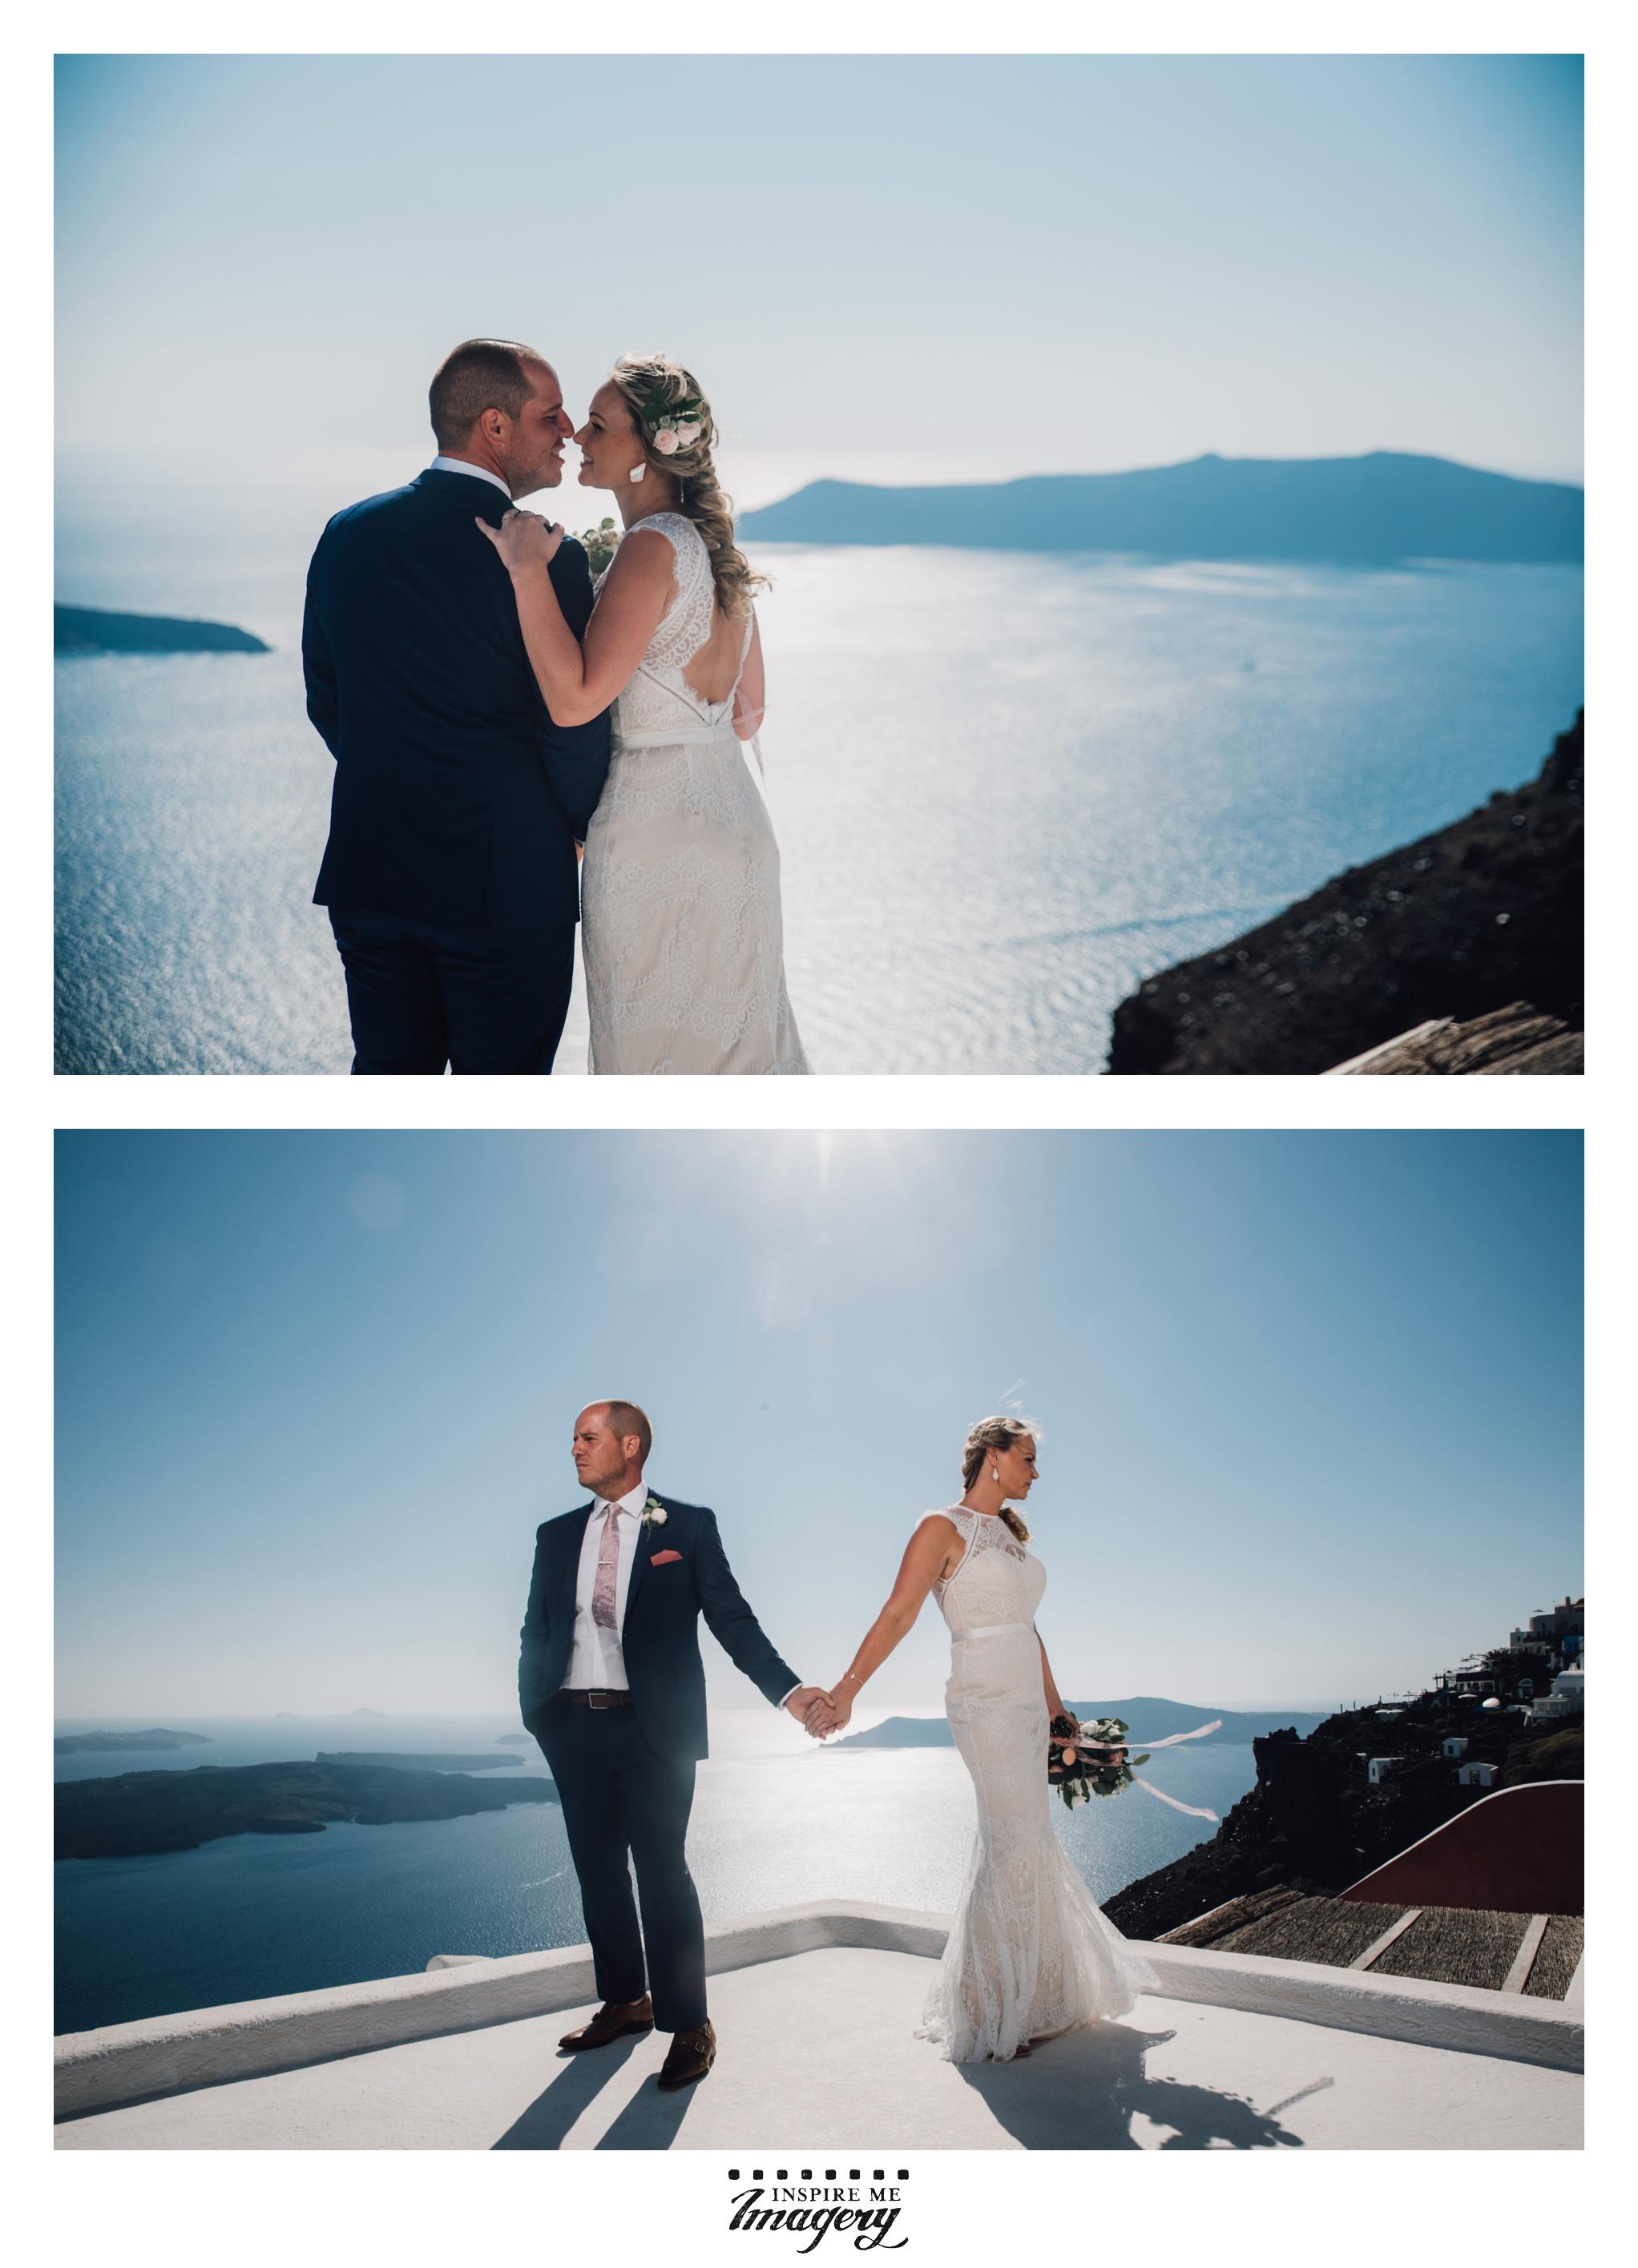 Greece-Santorini-Destination-Wedding-Photography15.jpg